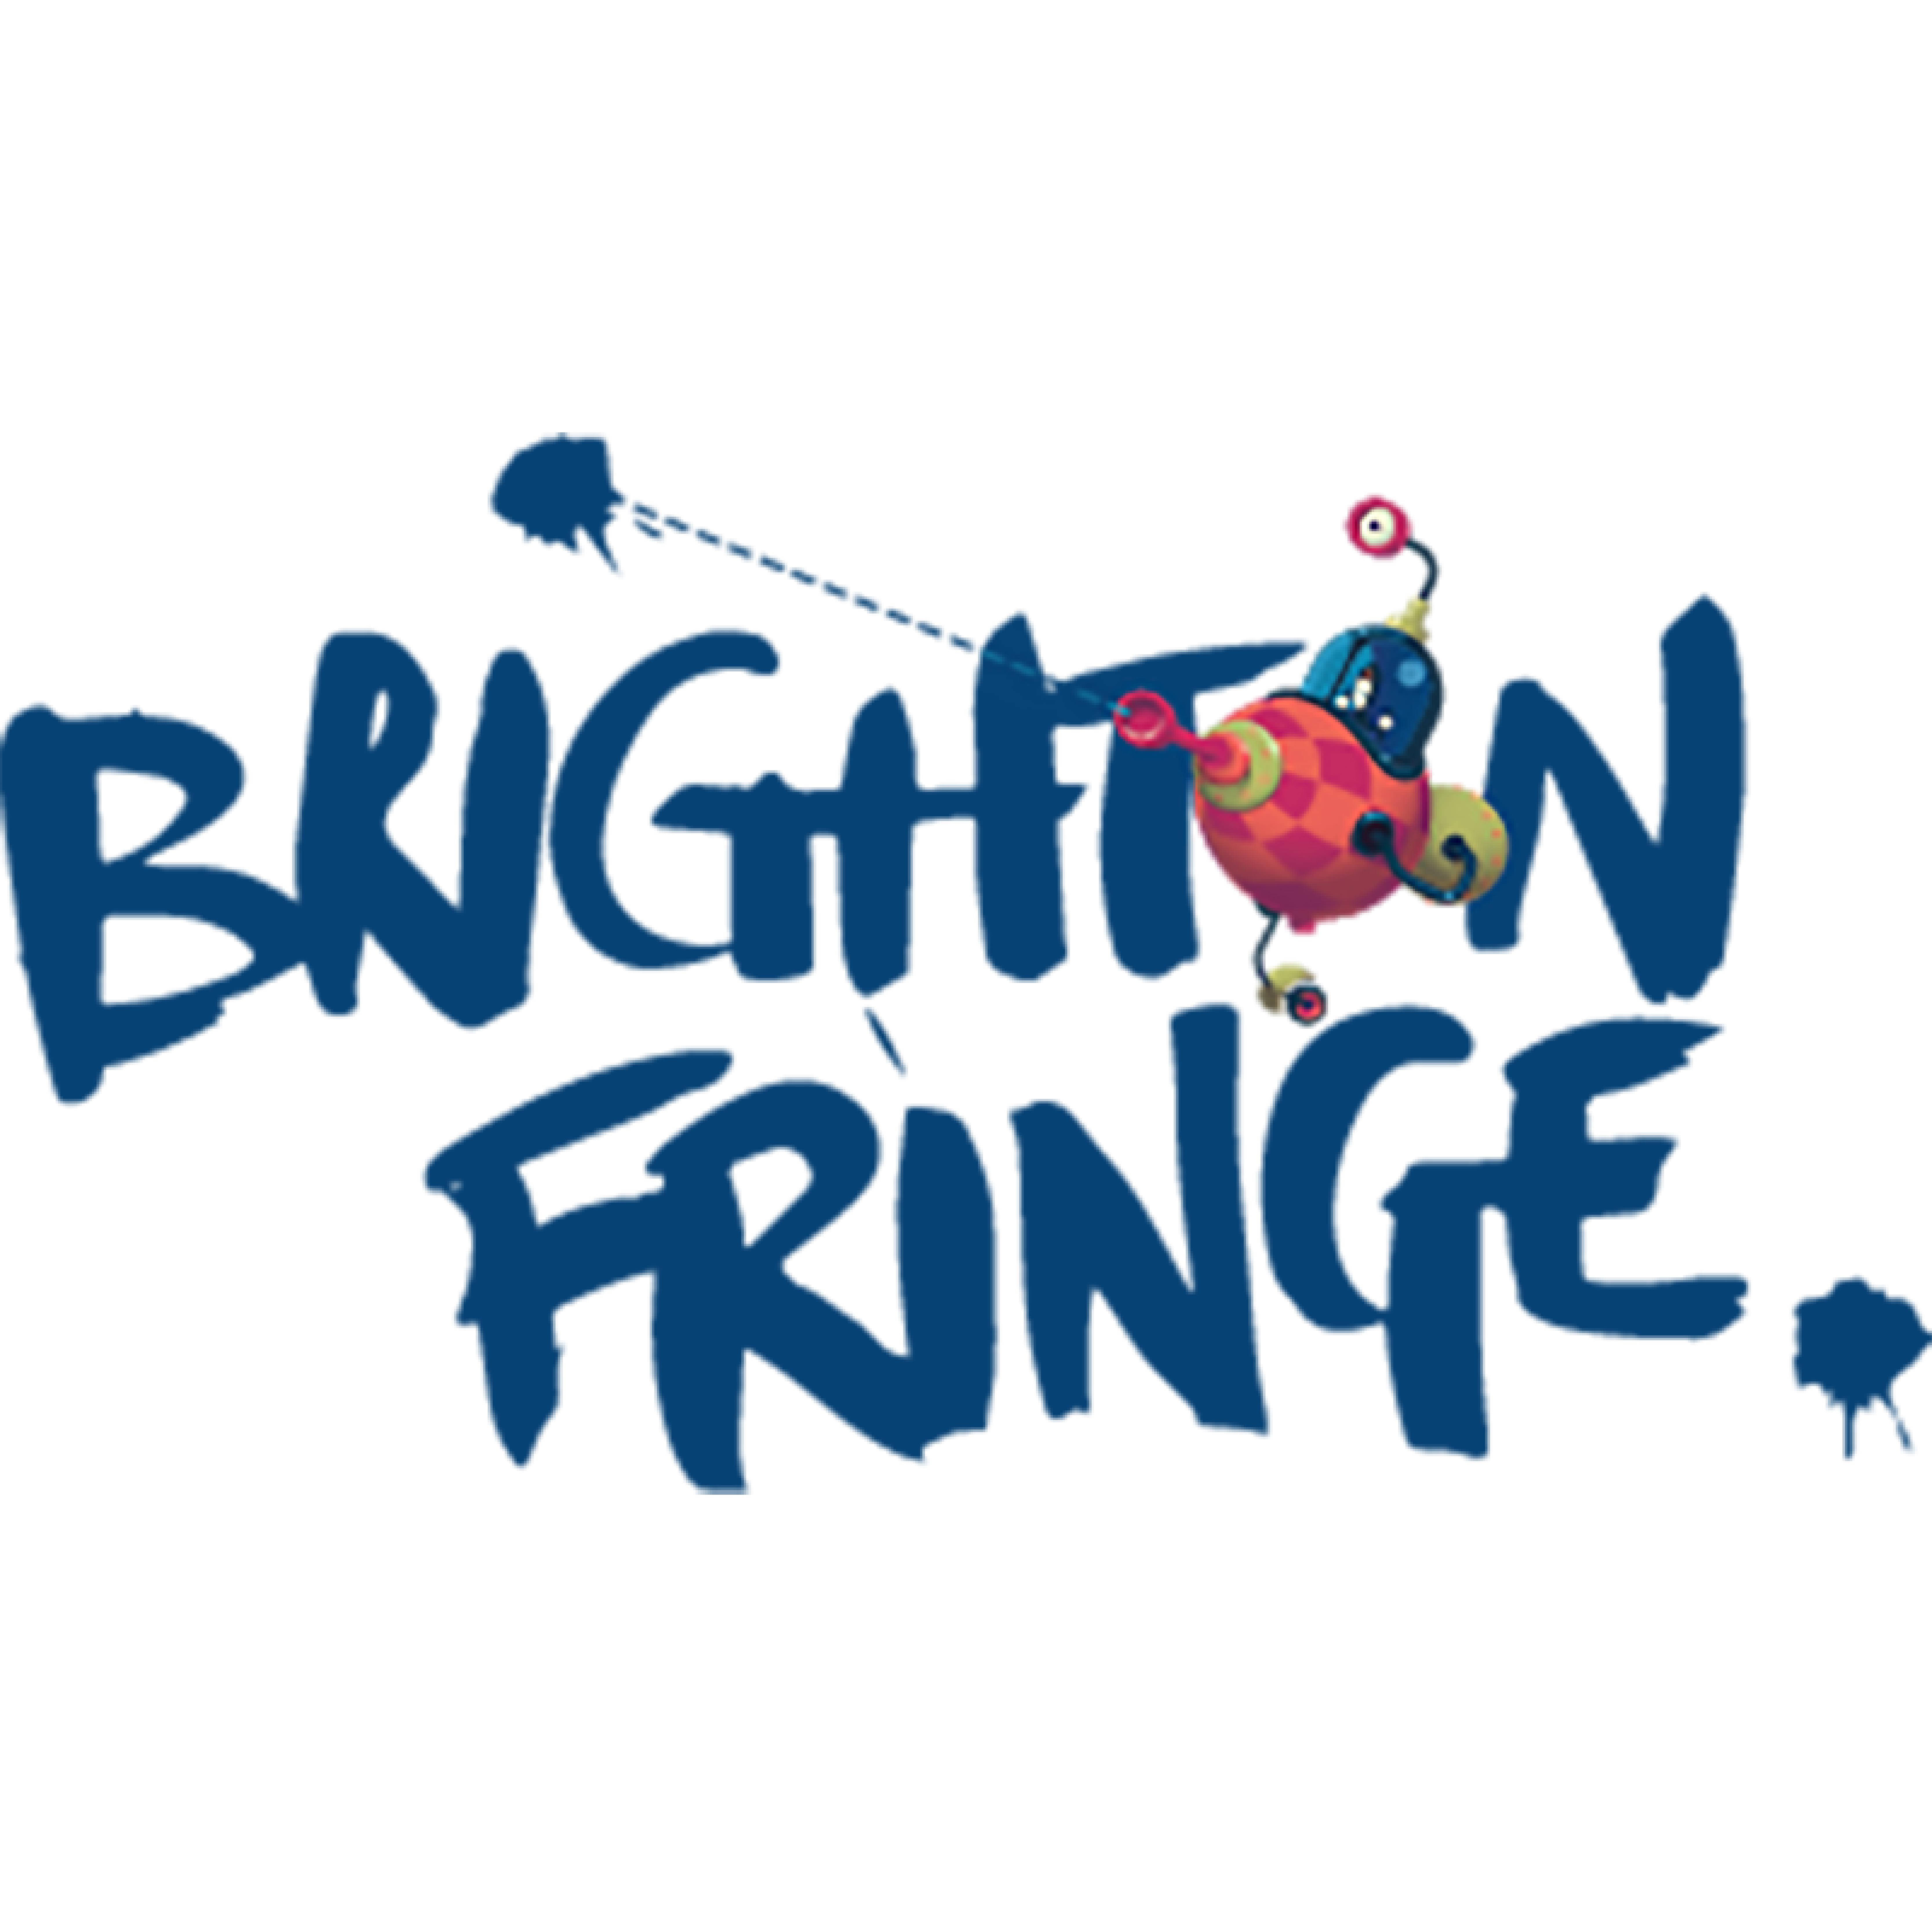 Brighton-Fringe-Festival